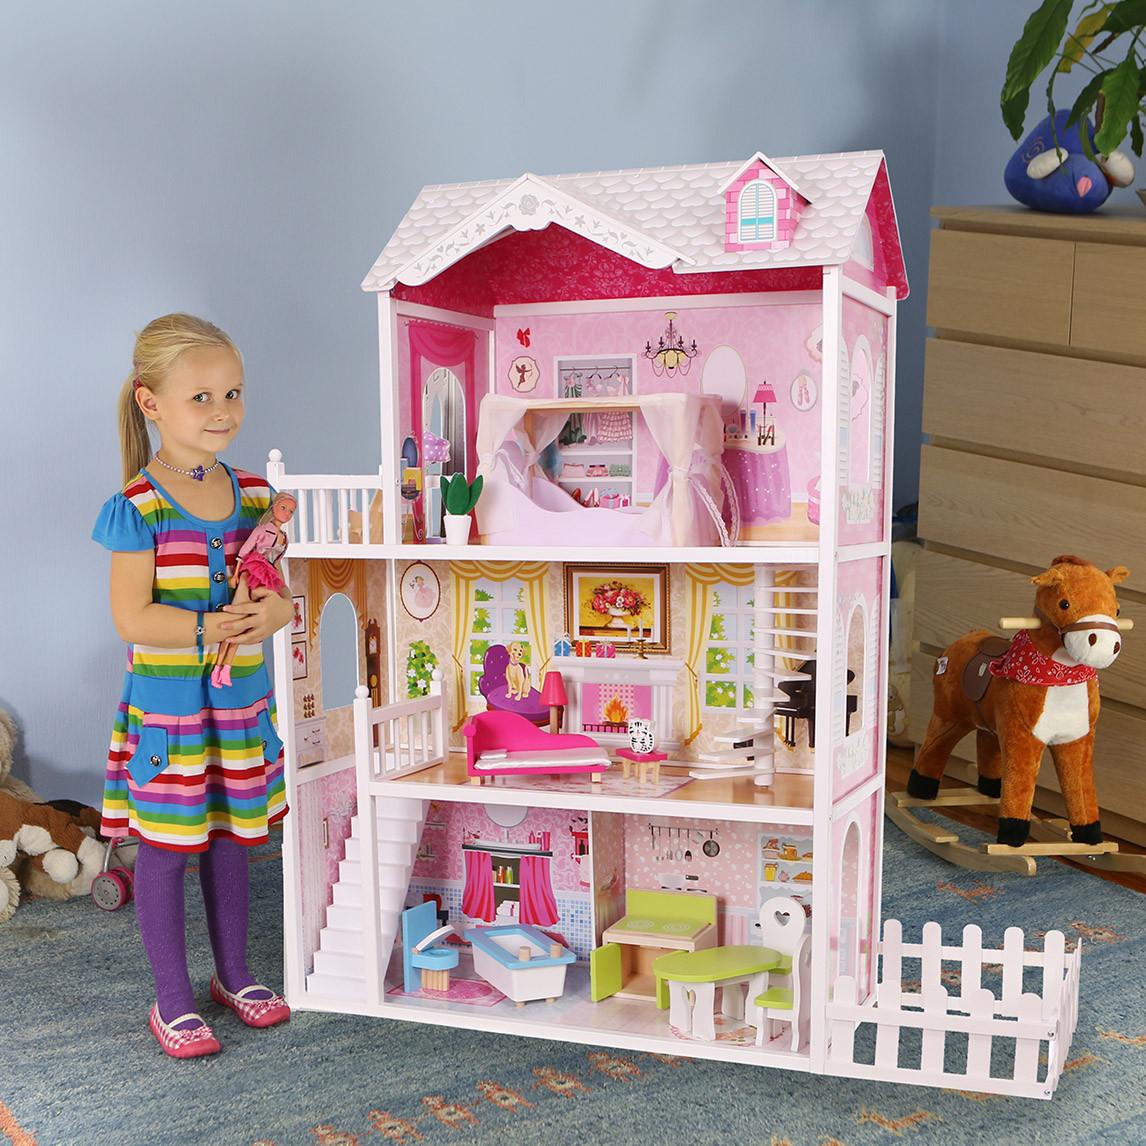 Дом для кукол барби с забором CALIFORNIA ECOTOYS, фото 1